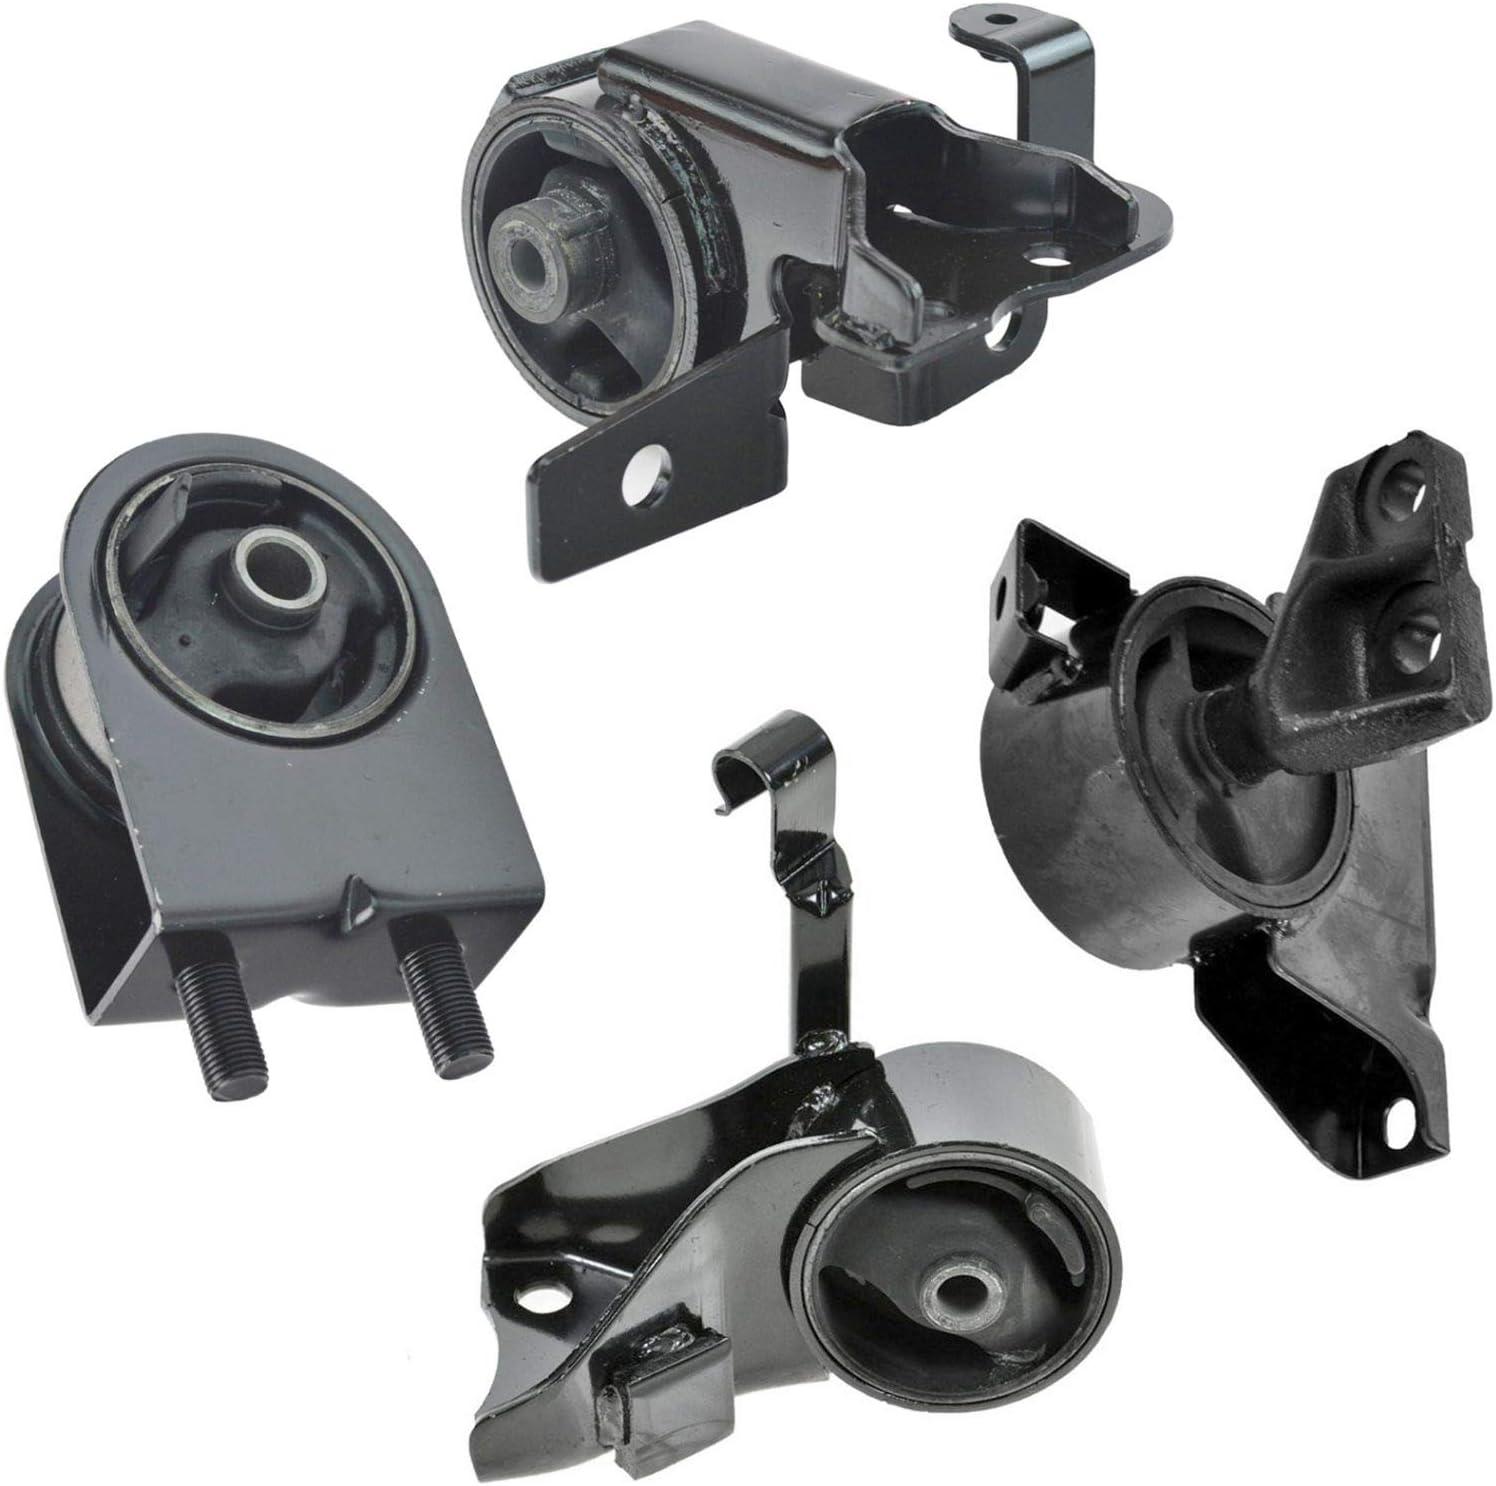 Engine Motor /& Trans Mount Manual Trans For 2001-2003 Mazda Protege 2.0L 4PCS